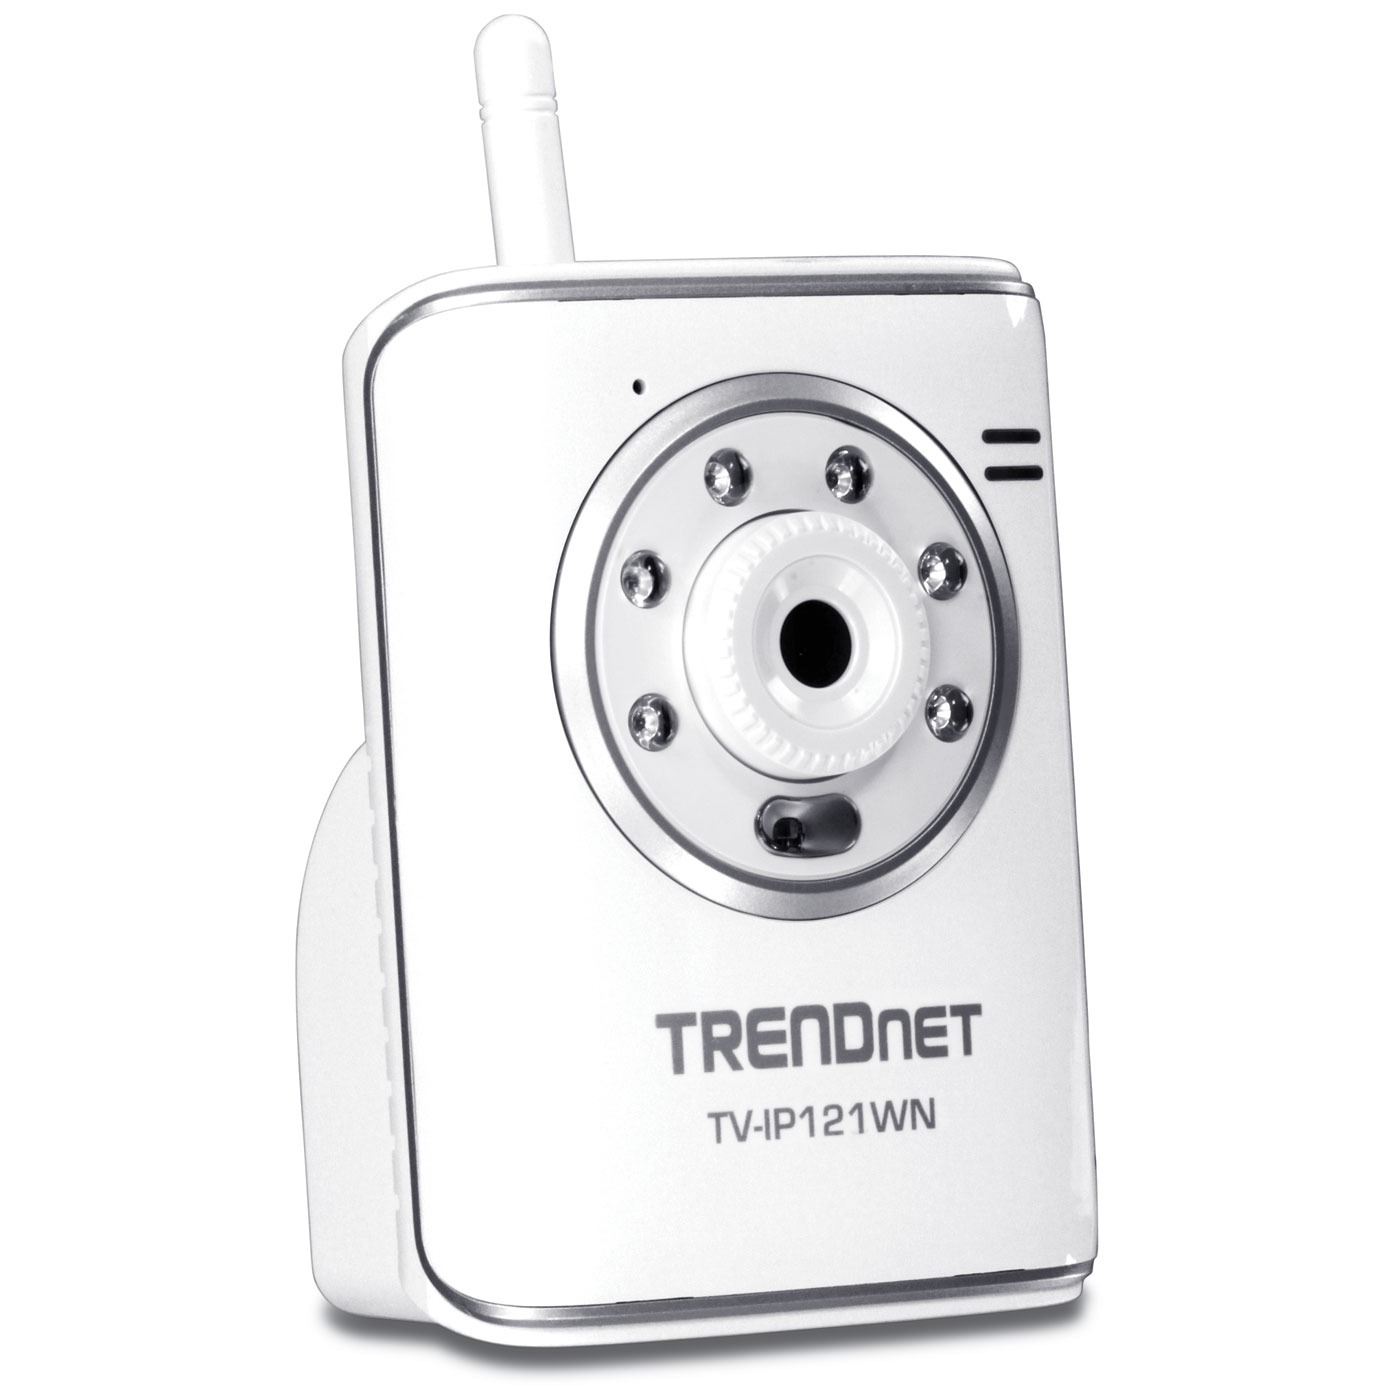 Caméra IP TRENDnet TV-IP121WN TRENDnet TV-IP121WN - Caméra IP jour/nuit WiFi N SecureView